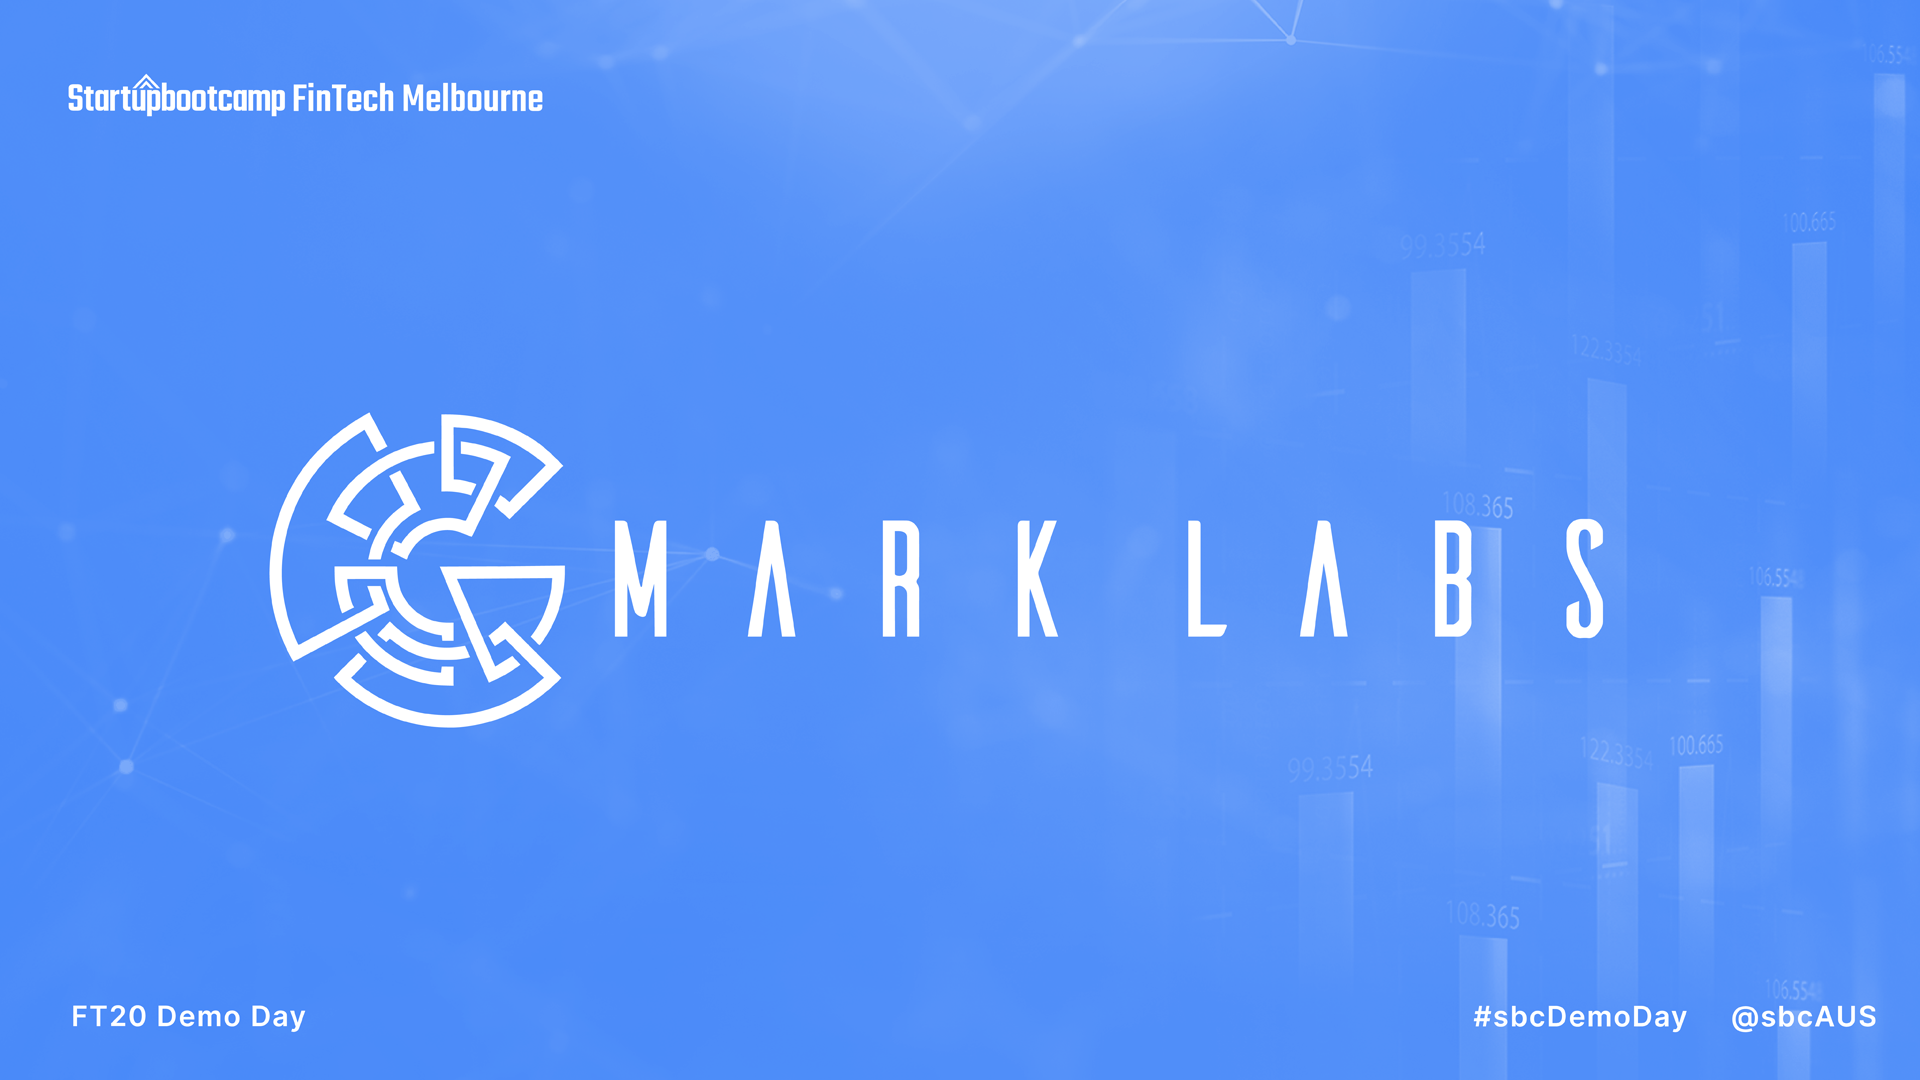 Mark Labs banner